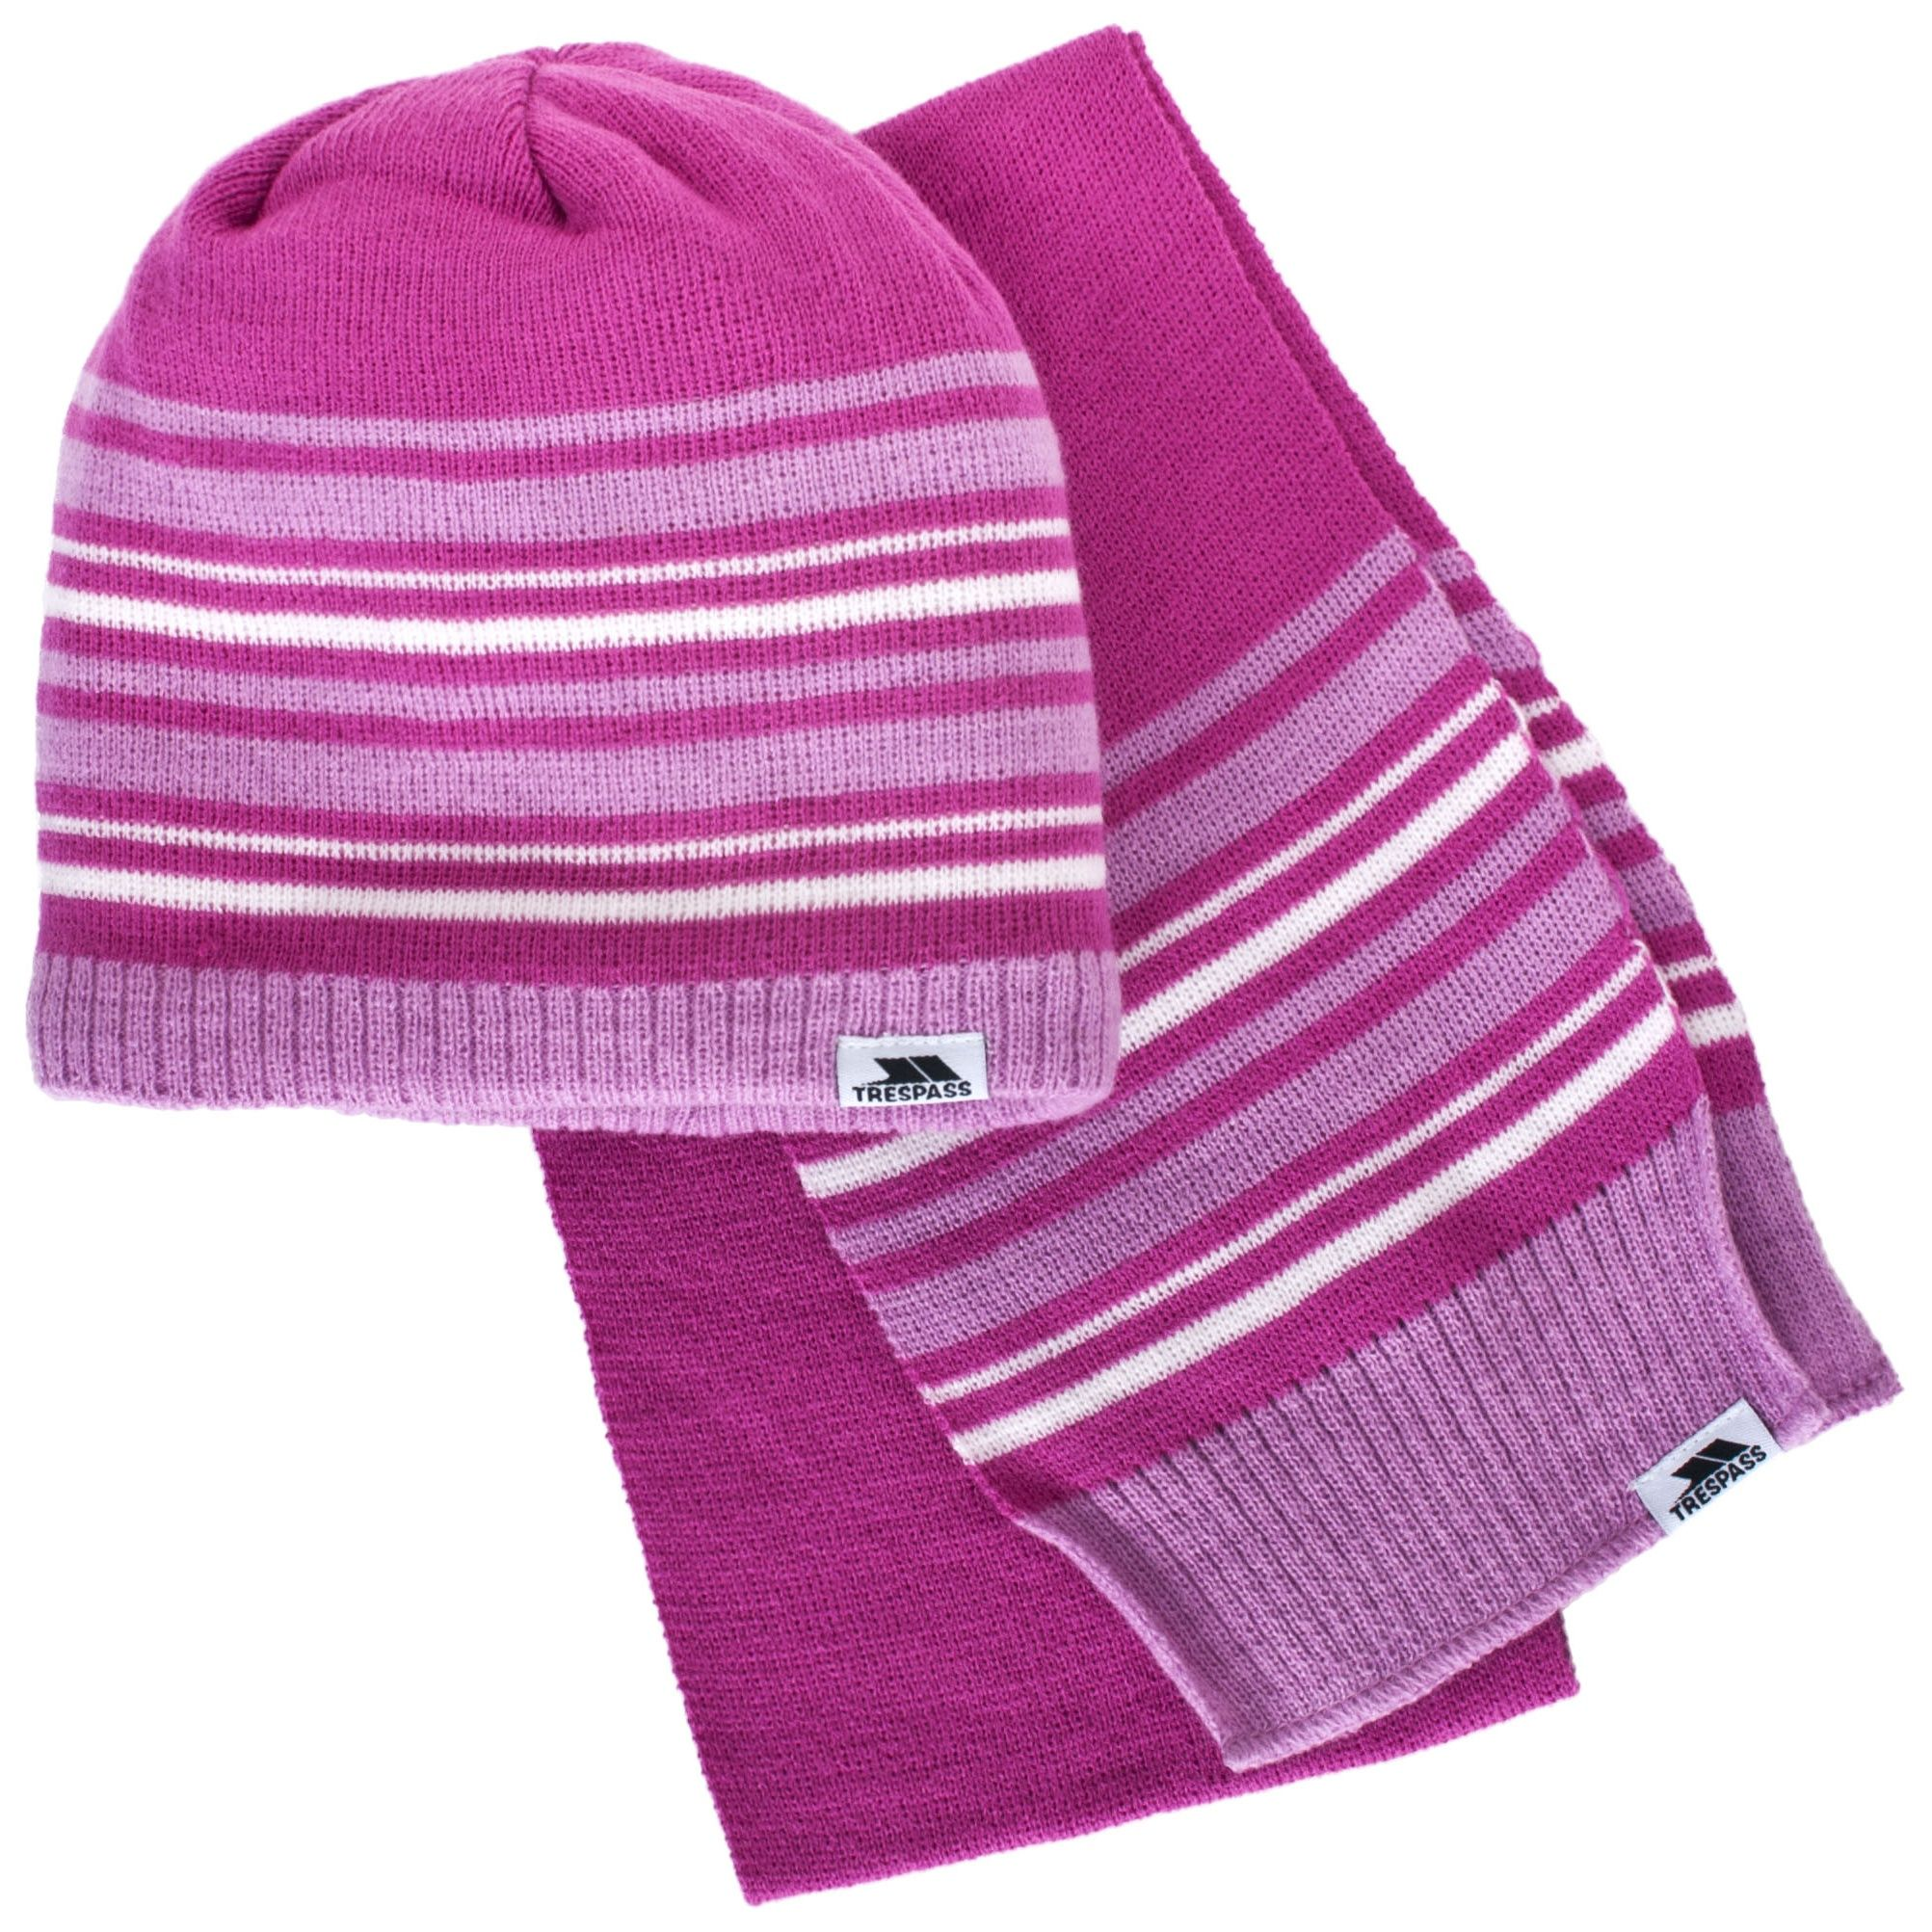 Trespass Childrens/Kids Hedgehog Winter Hat And Scarf Set